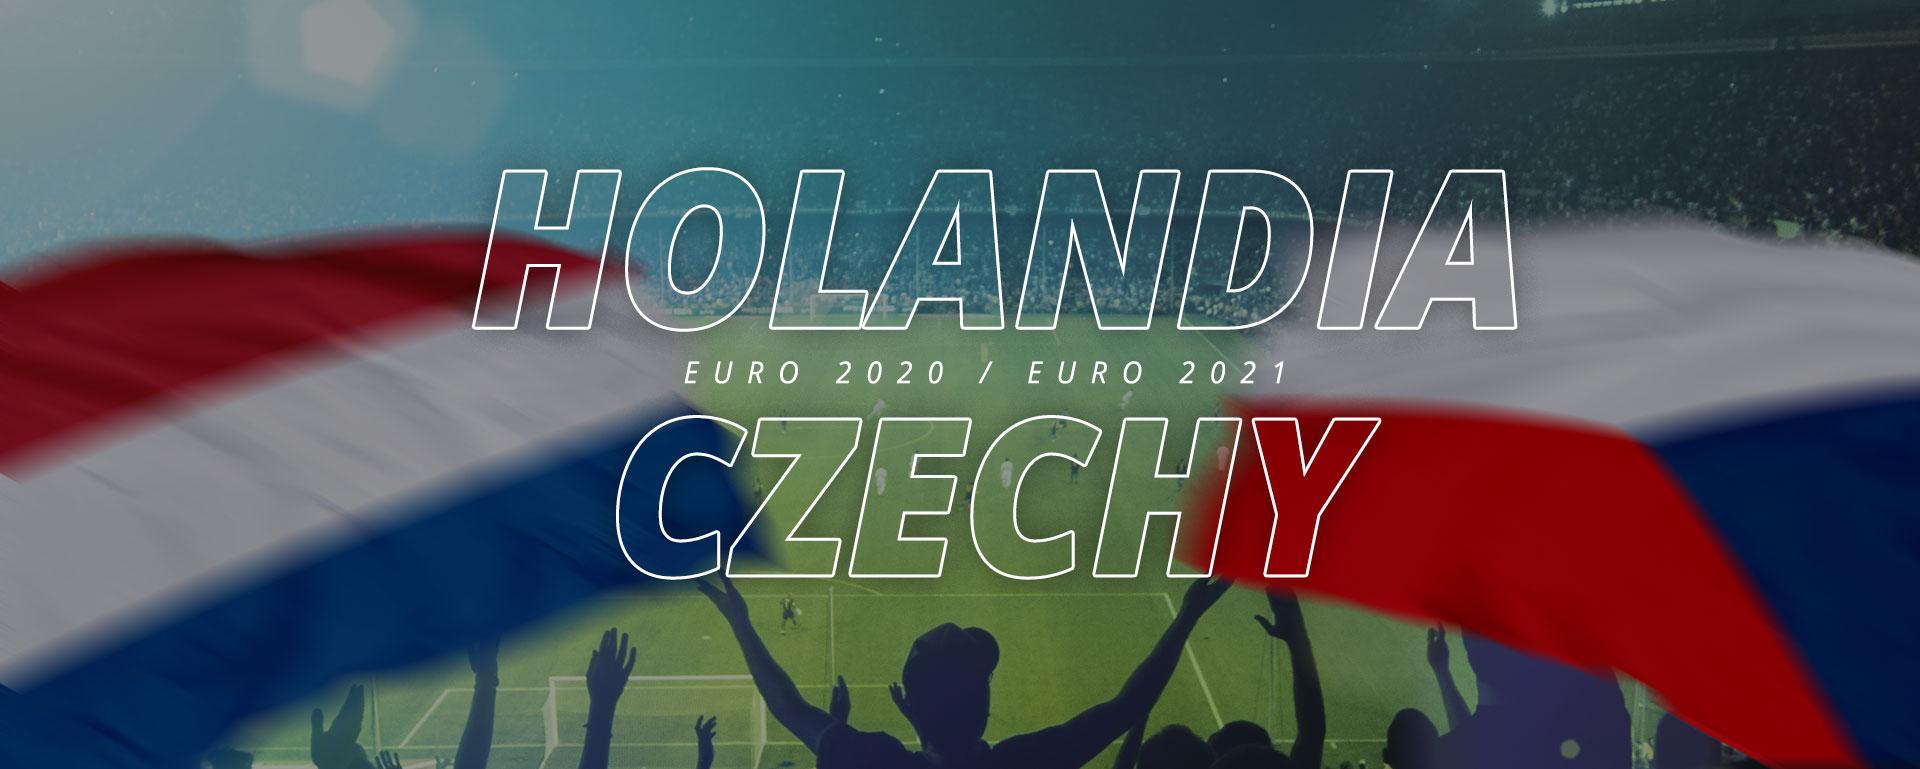 Holandia – Czechy | 1/8 finału Euro 2020 / Euro 2021